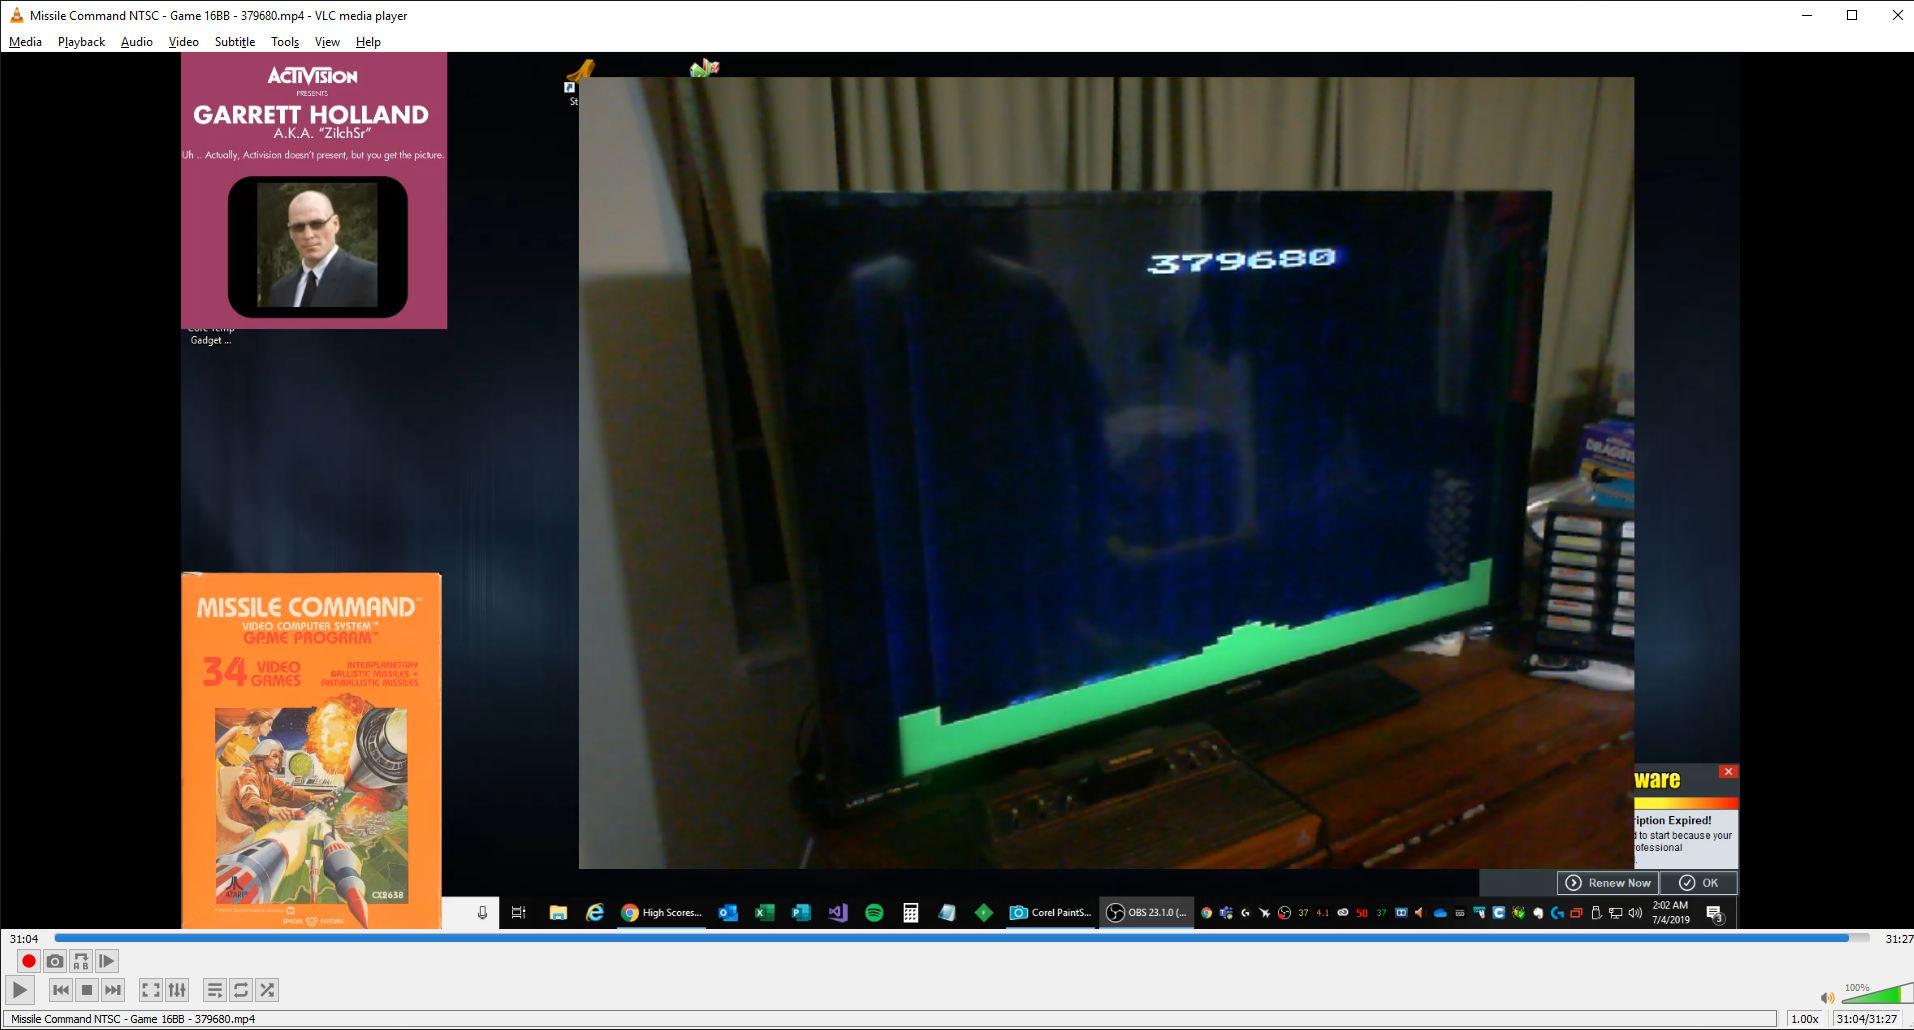 ZilchSr: Missile Command: Game 16 (Atari 2600 Novice/B) 379,680 points on 2019-07-04 01:12:34